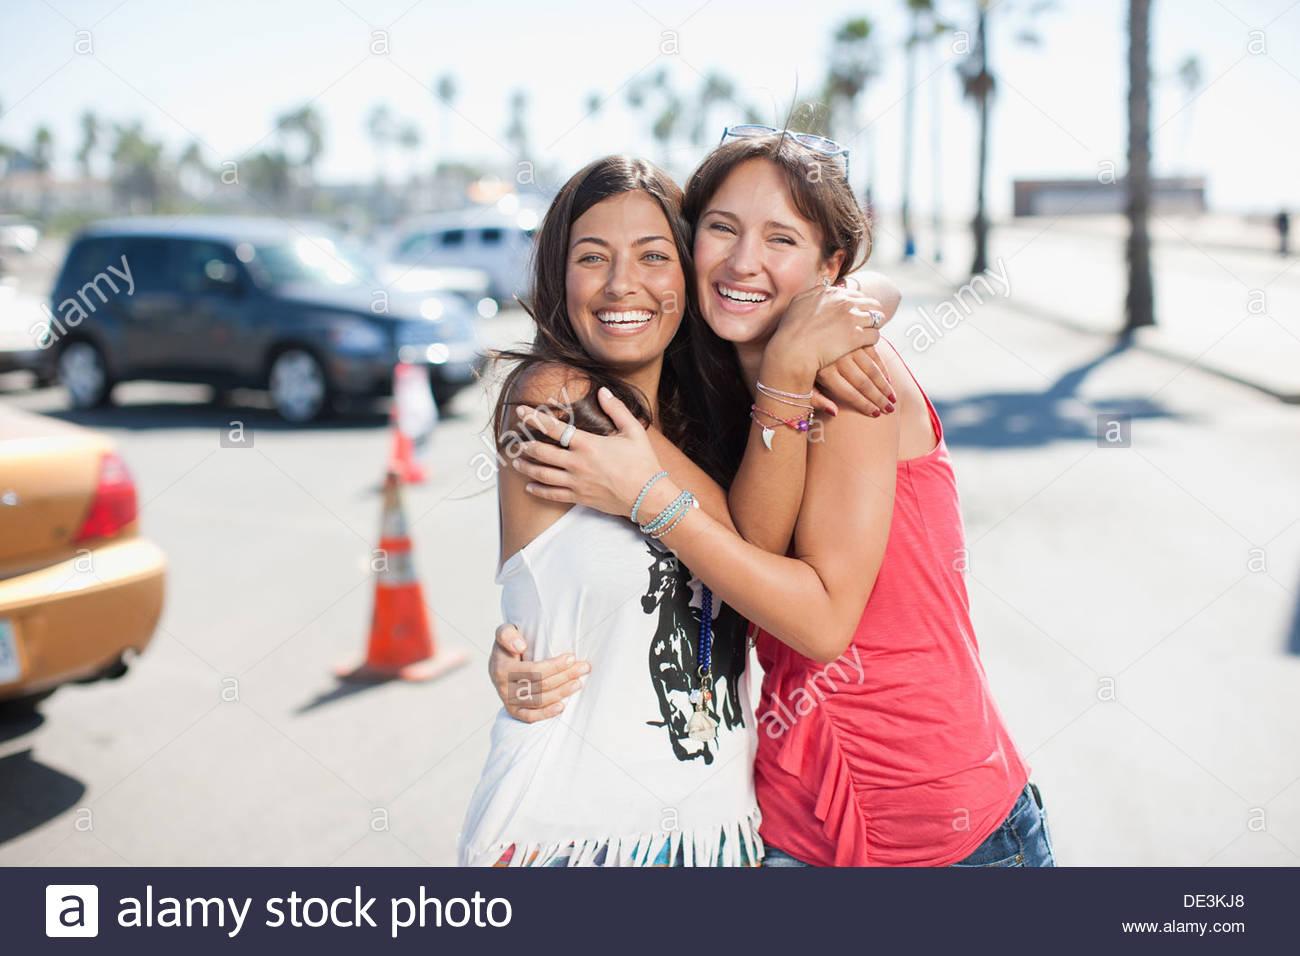 Two women hugging - Stock Image